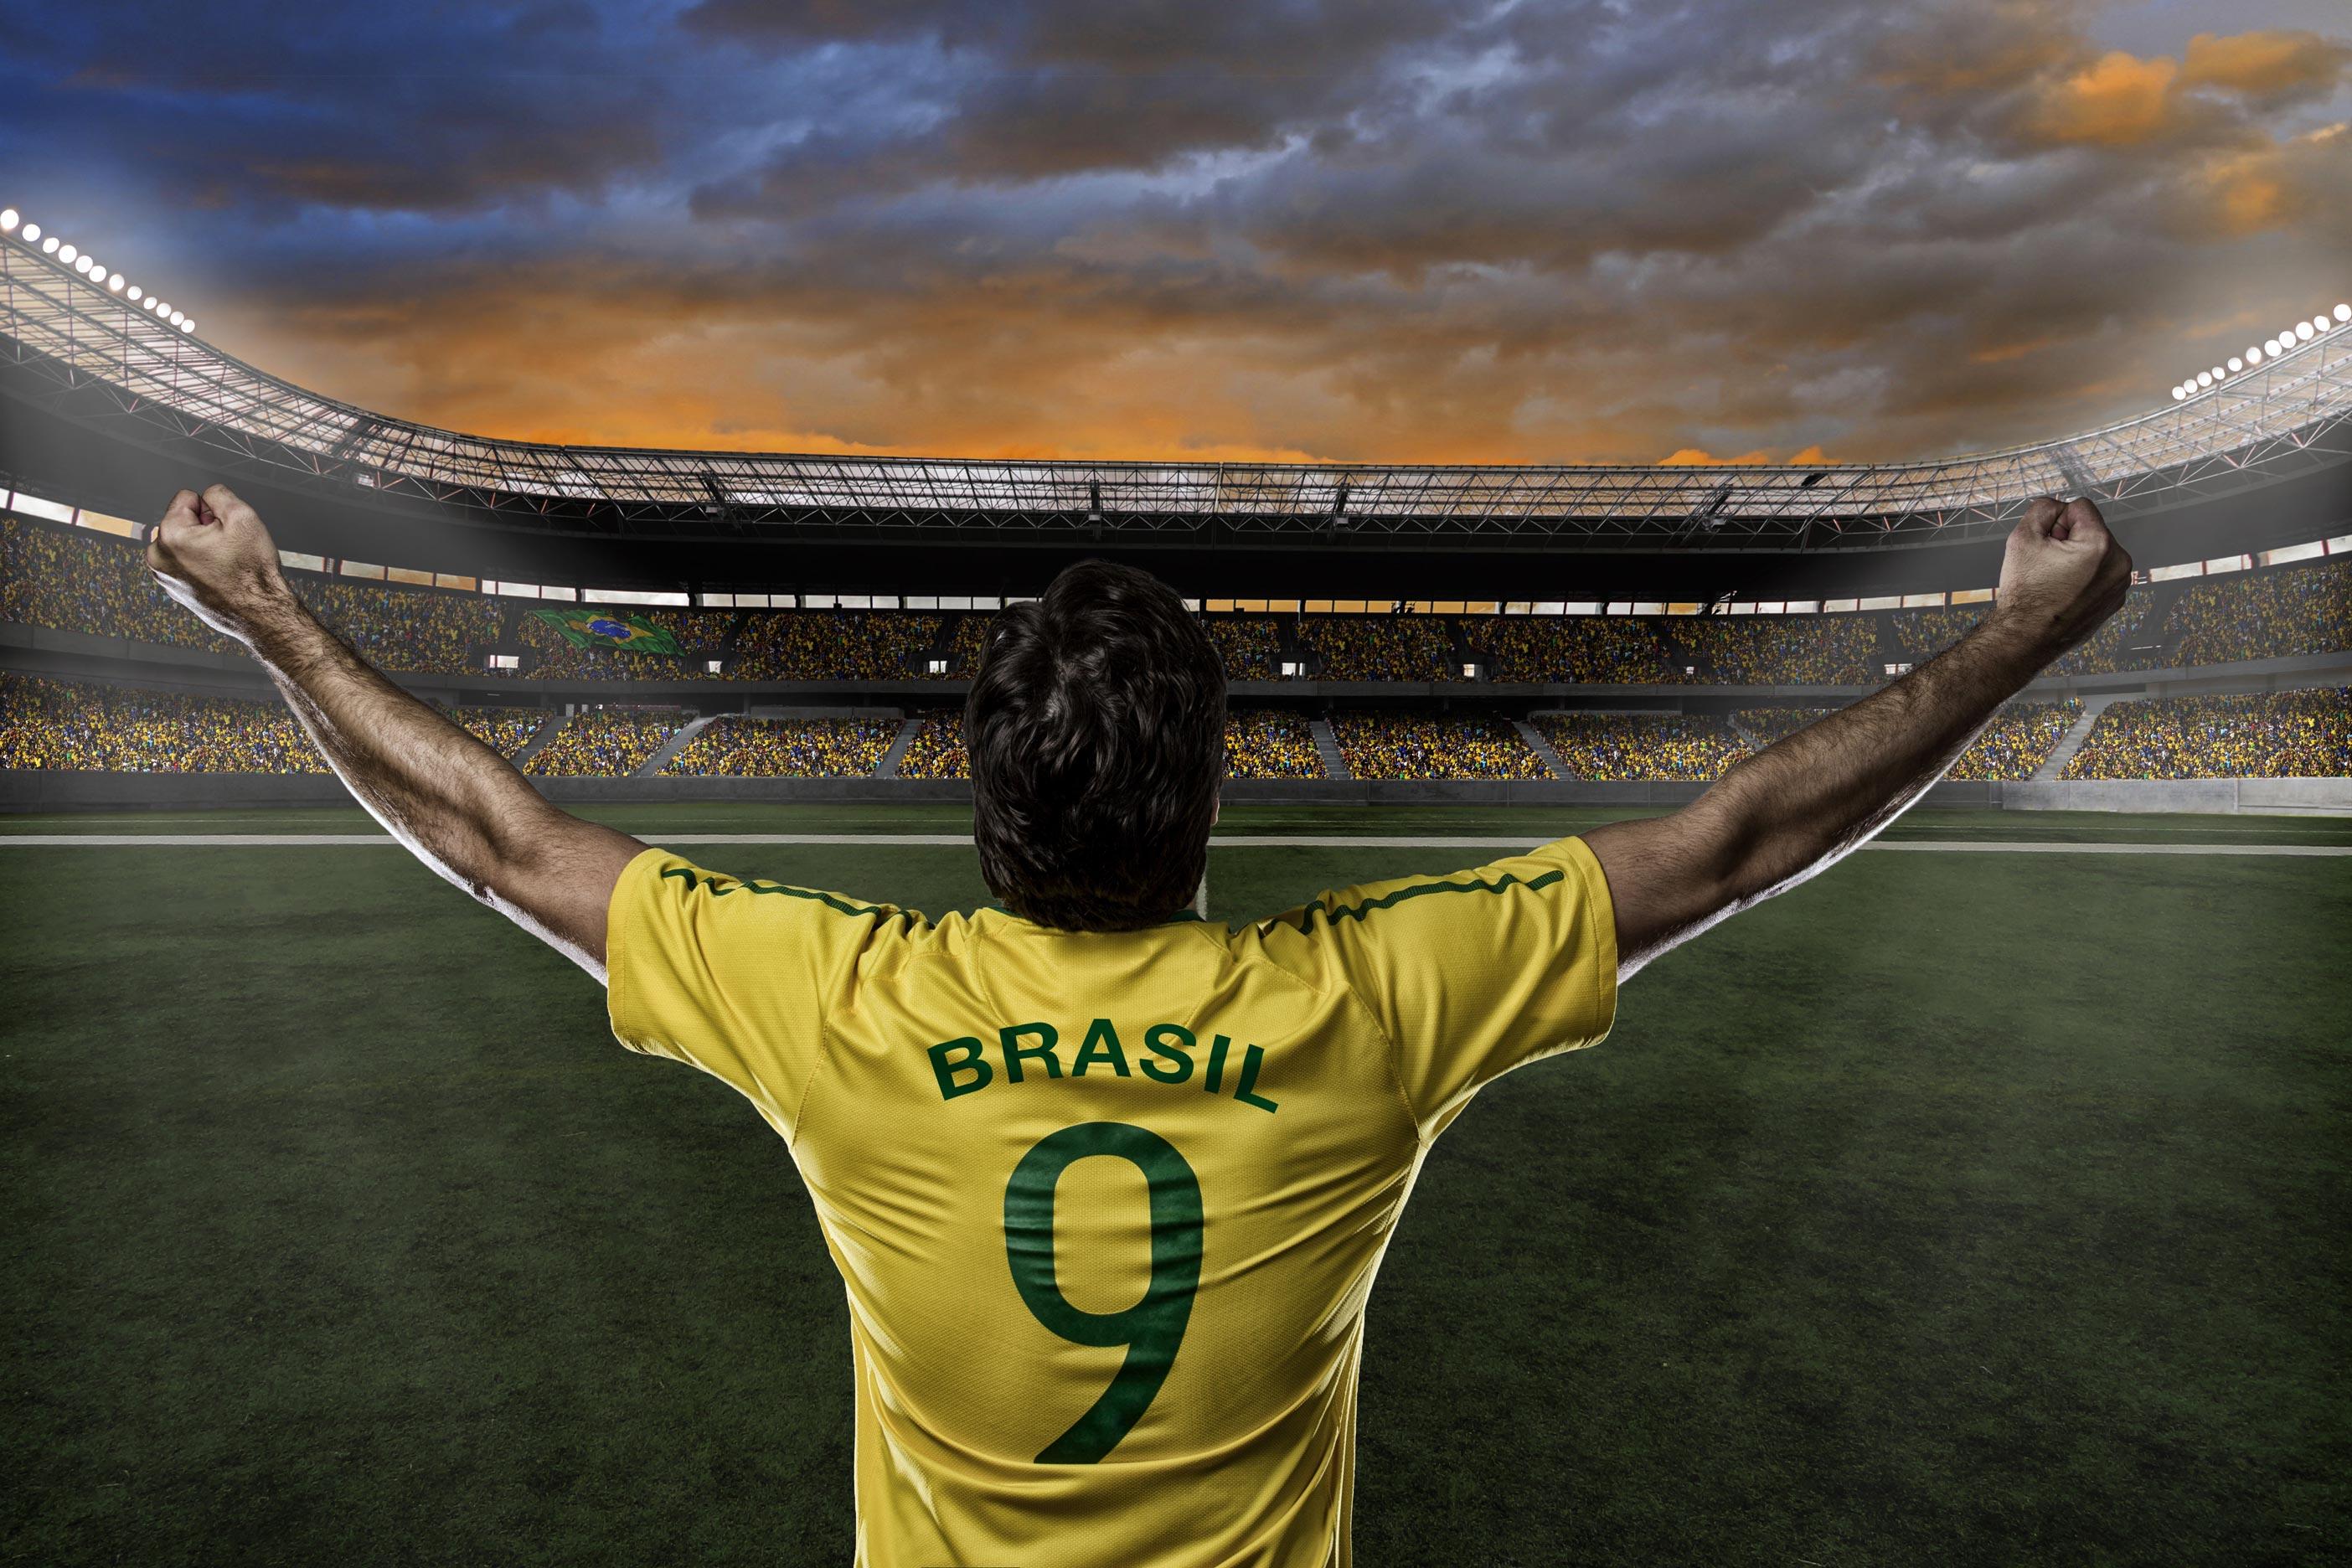 Foto jogador de futebol: Shutterstock.